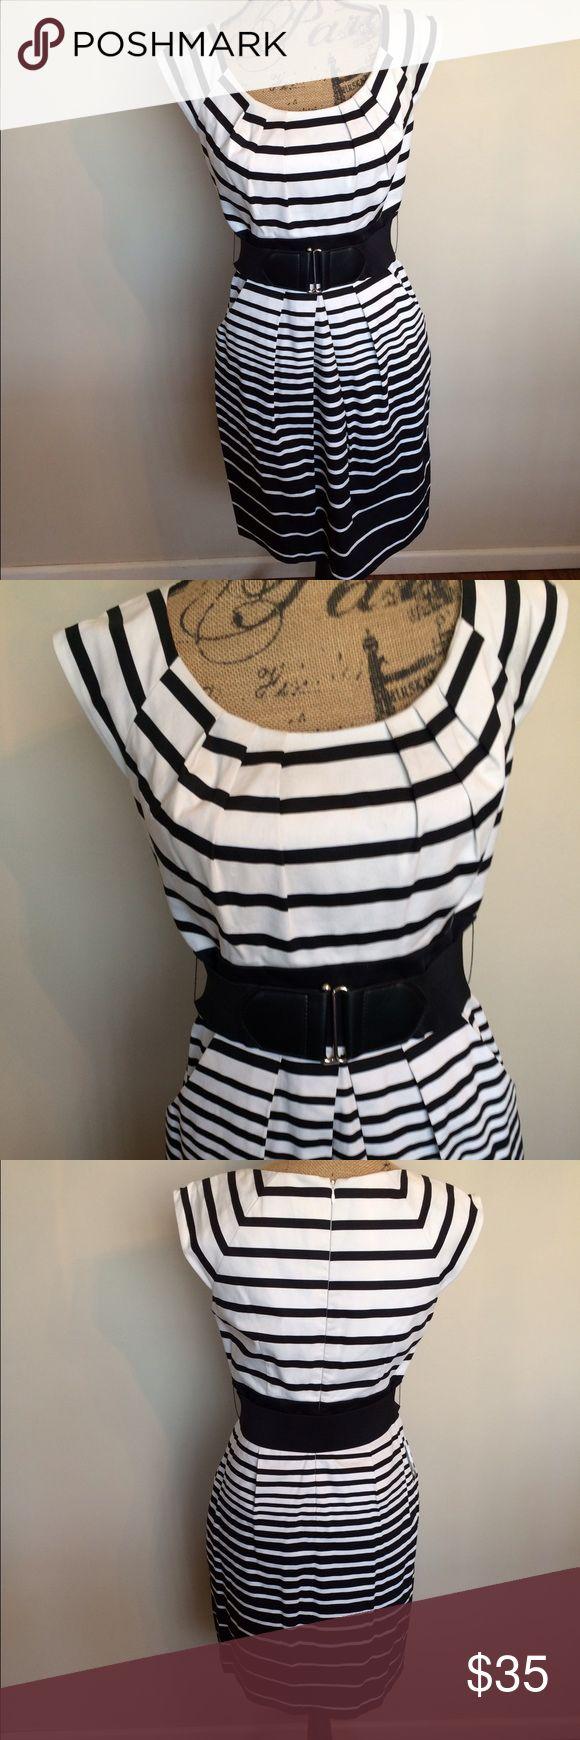 1000  ideas about Black White Striped Dress on Pinterest - Striped ...